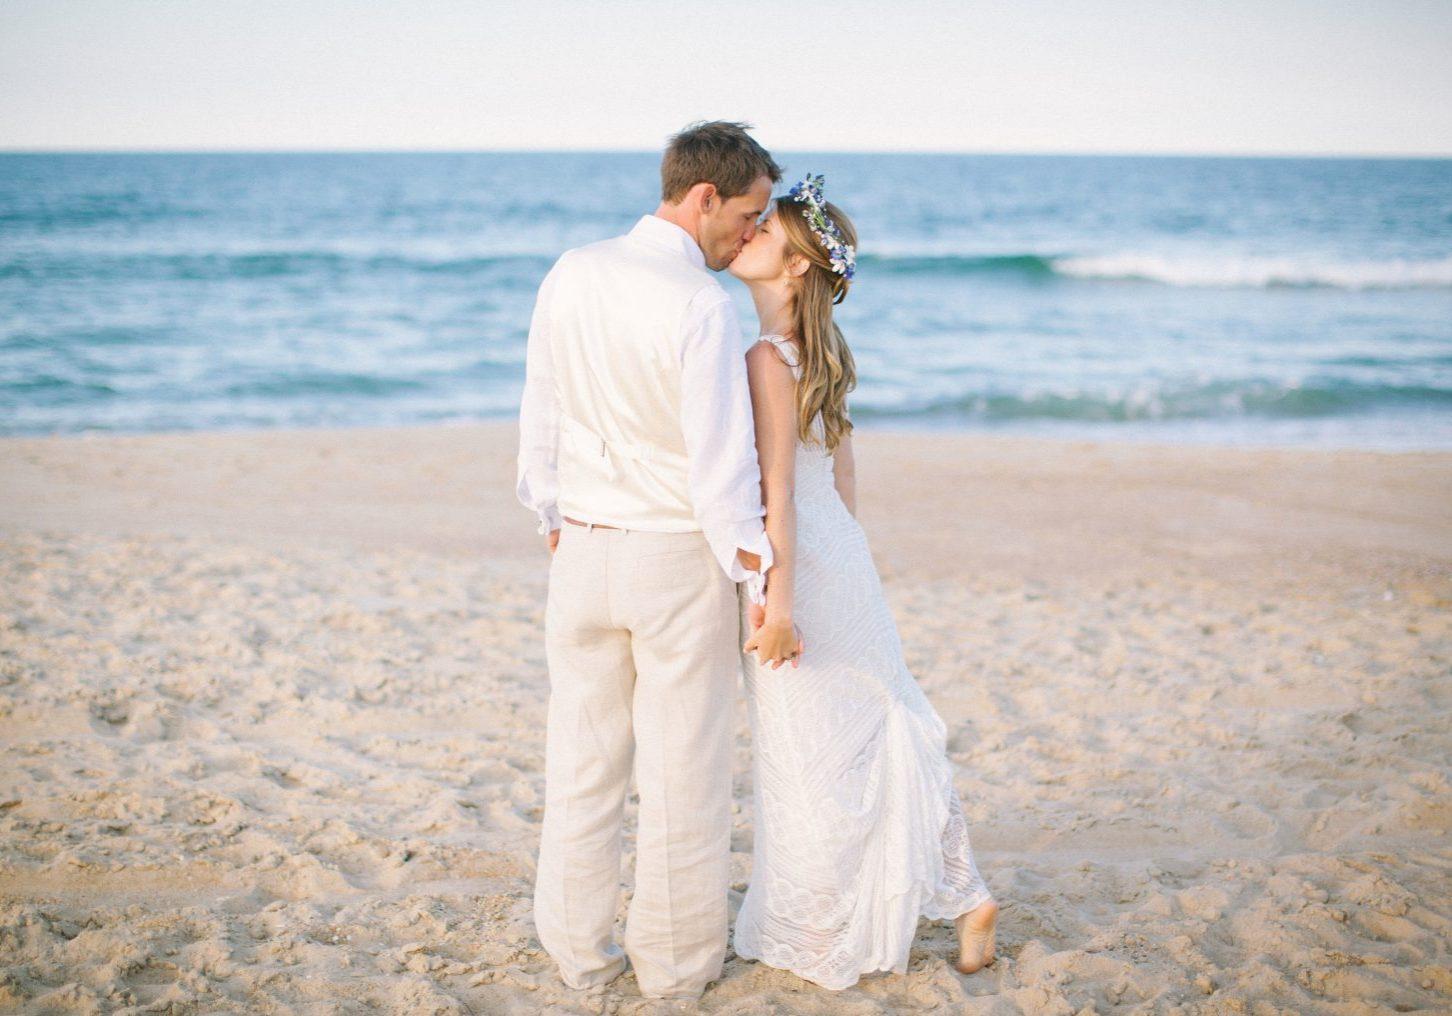 weddingphotos-707